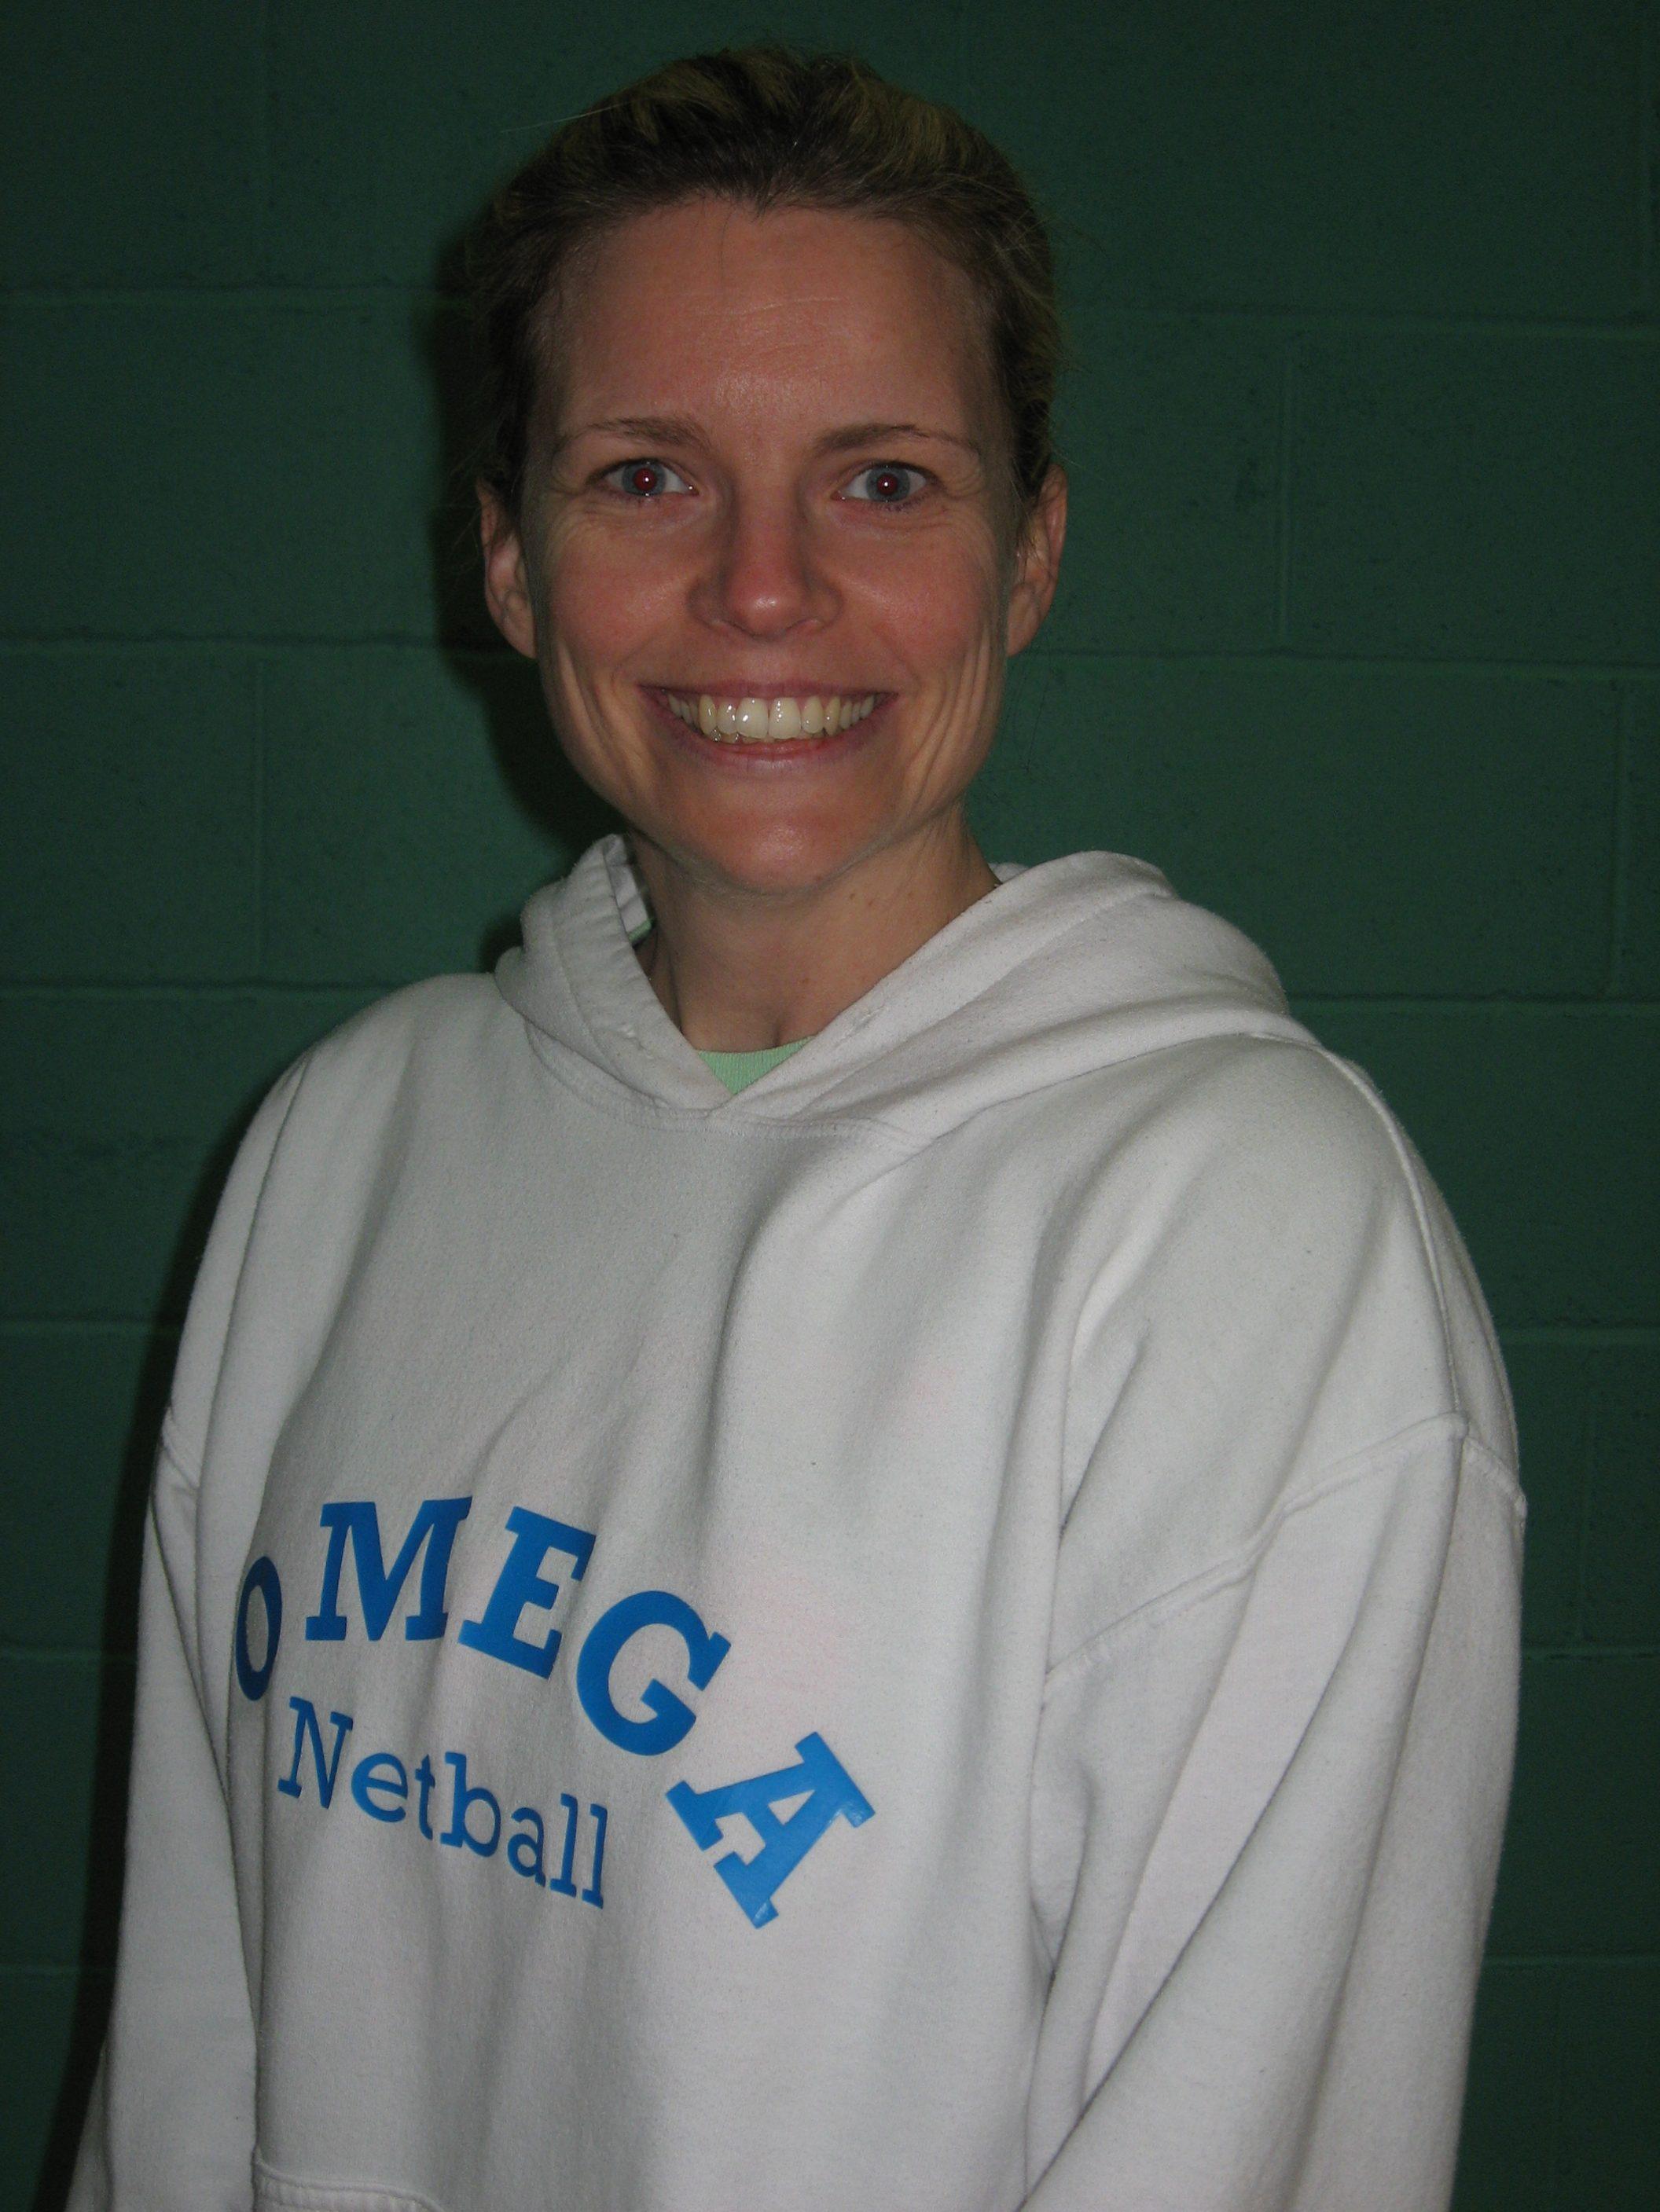 Claire Statham - Coach